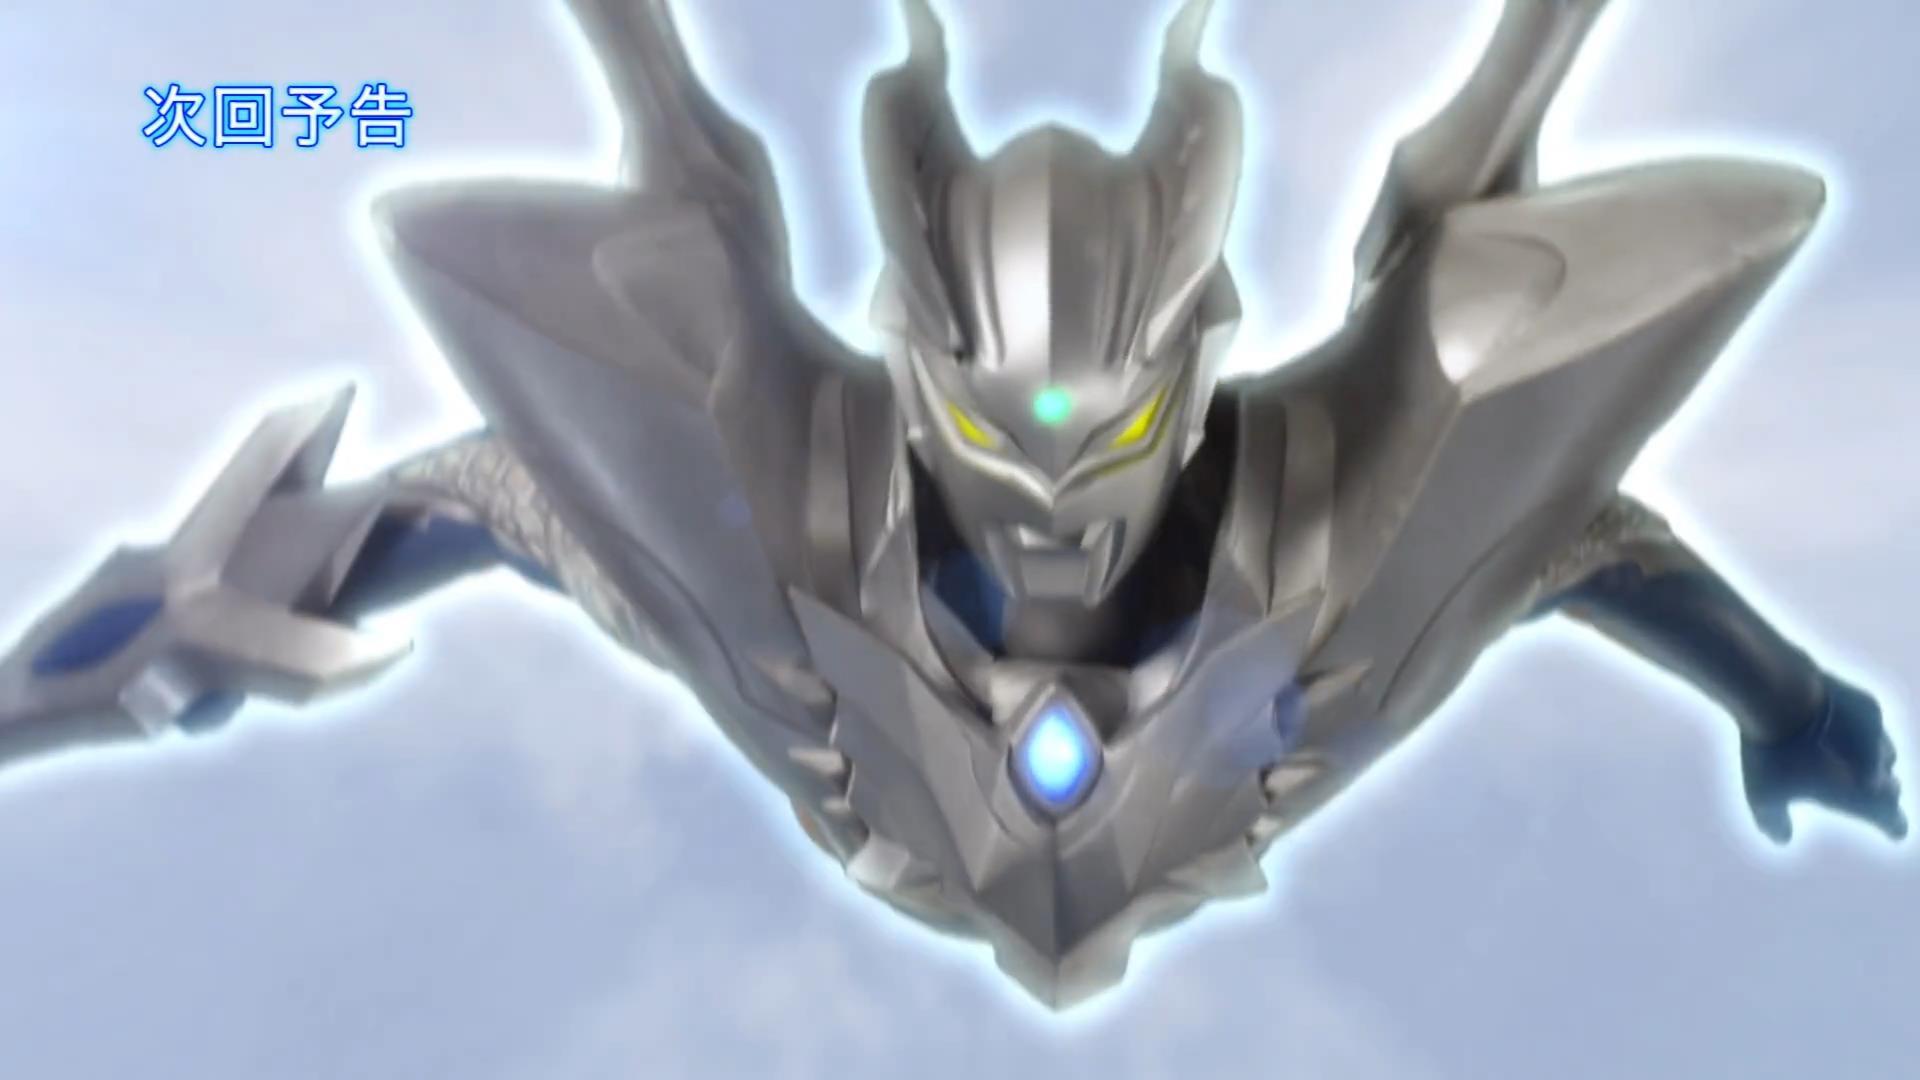 Next Time on Ultraman X: Episode 5